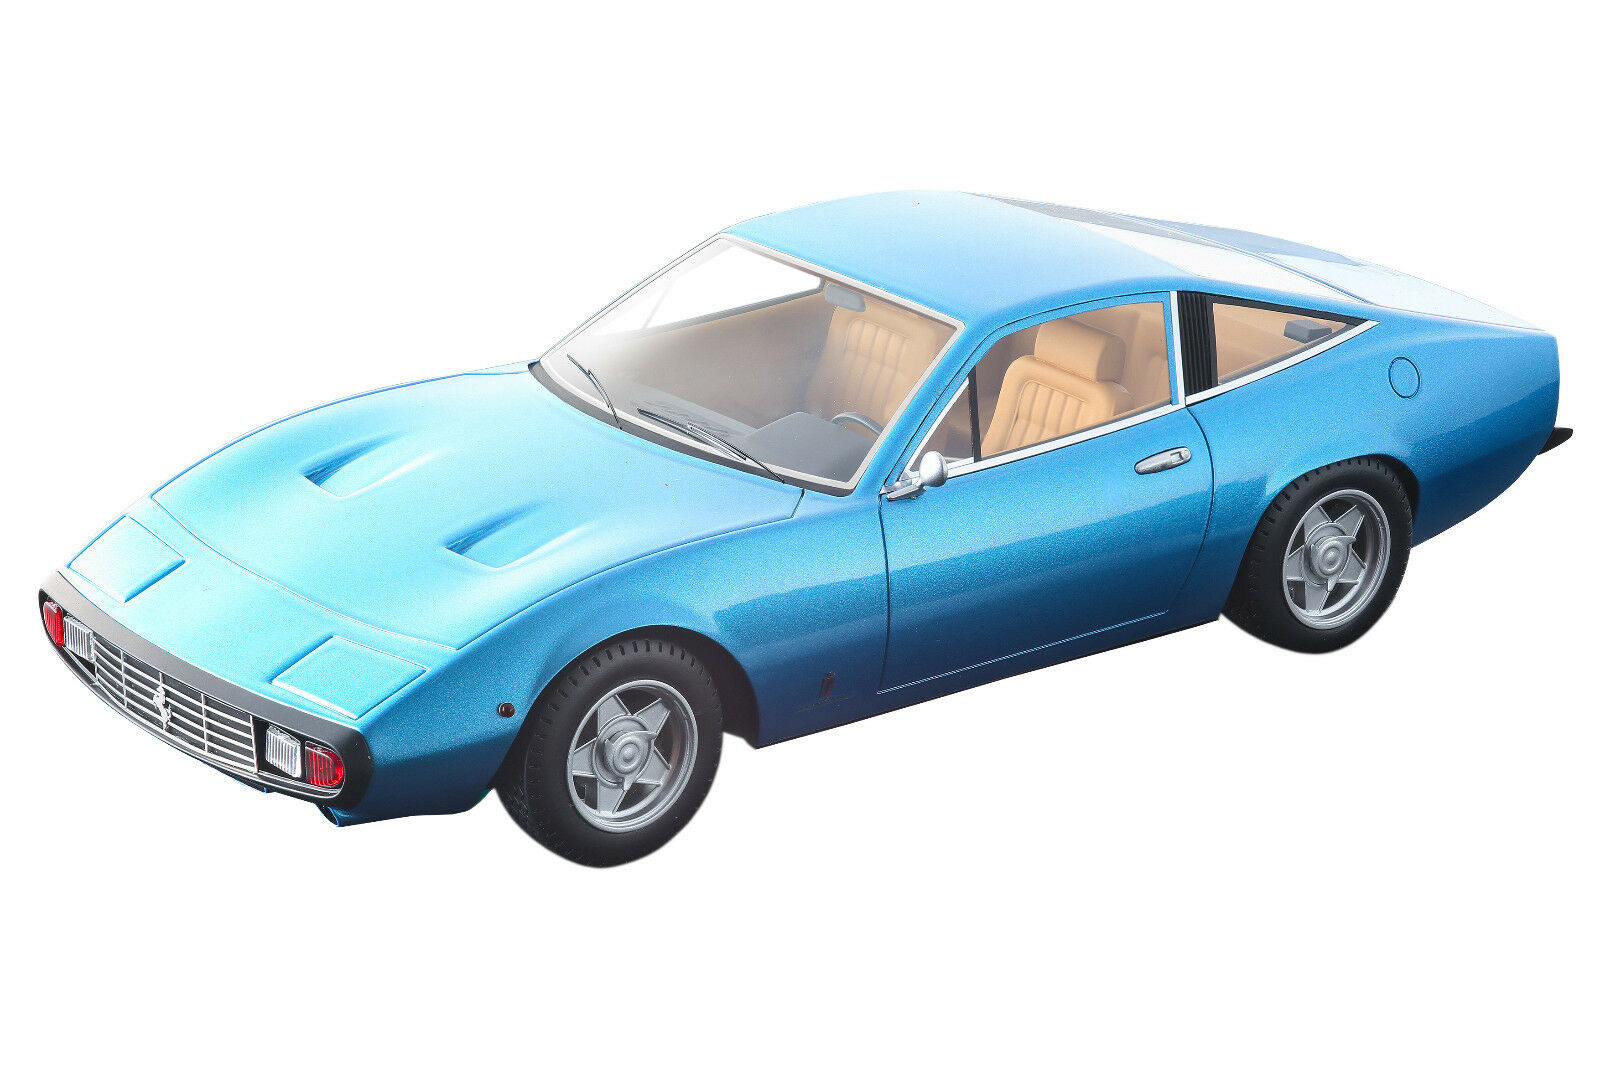 1971 Ferrari 365 GTC 4 Azzurro California bleu Limited Ed 1 18 TECNOMODEL TM18-92C